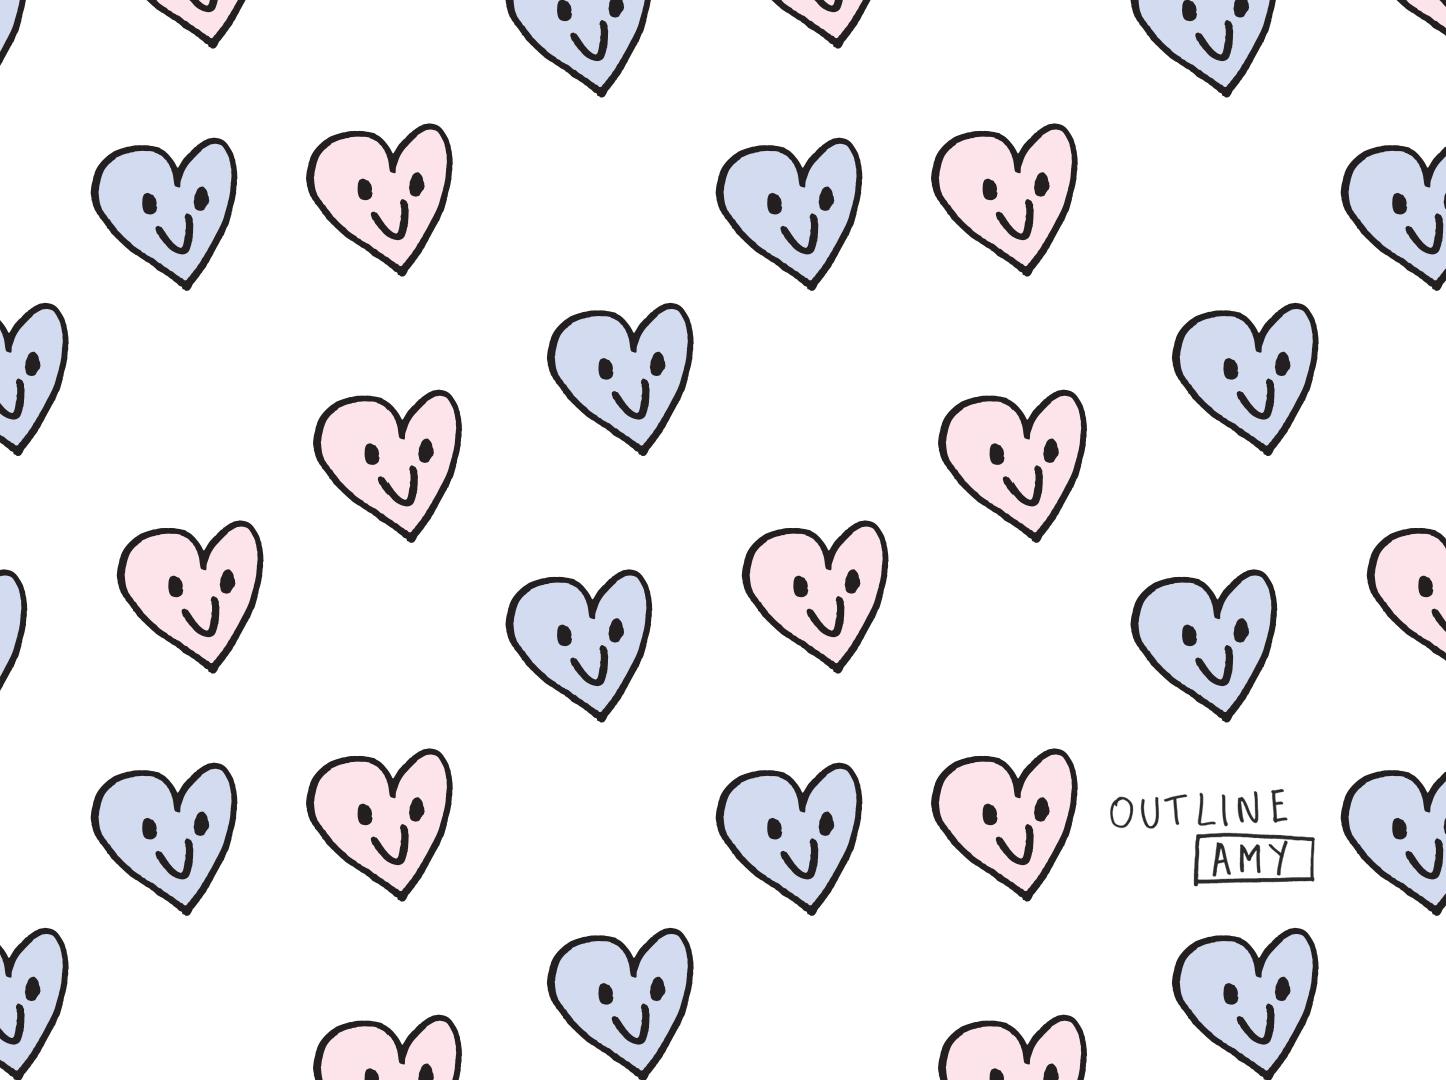 Free heart illustration desktop and iphone wallpaper